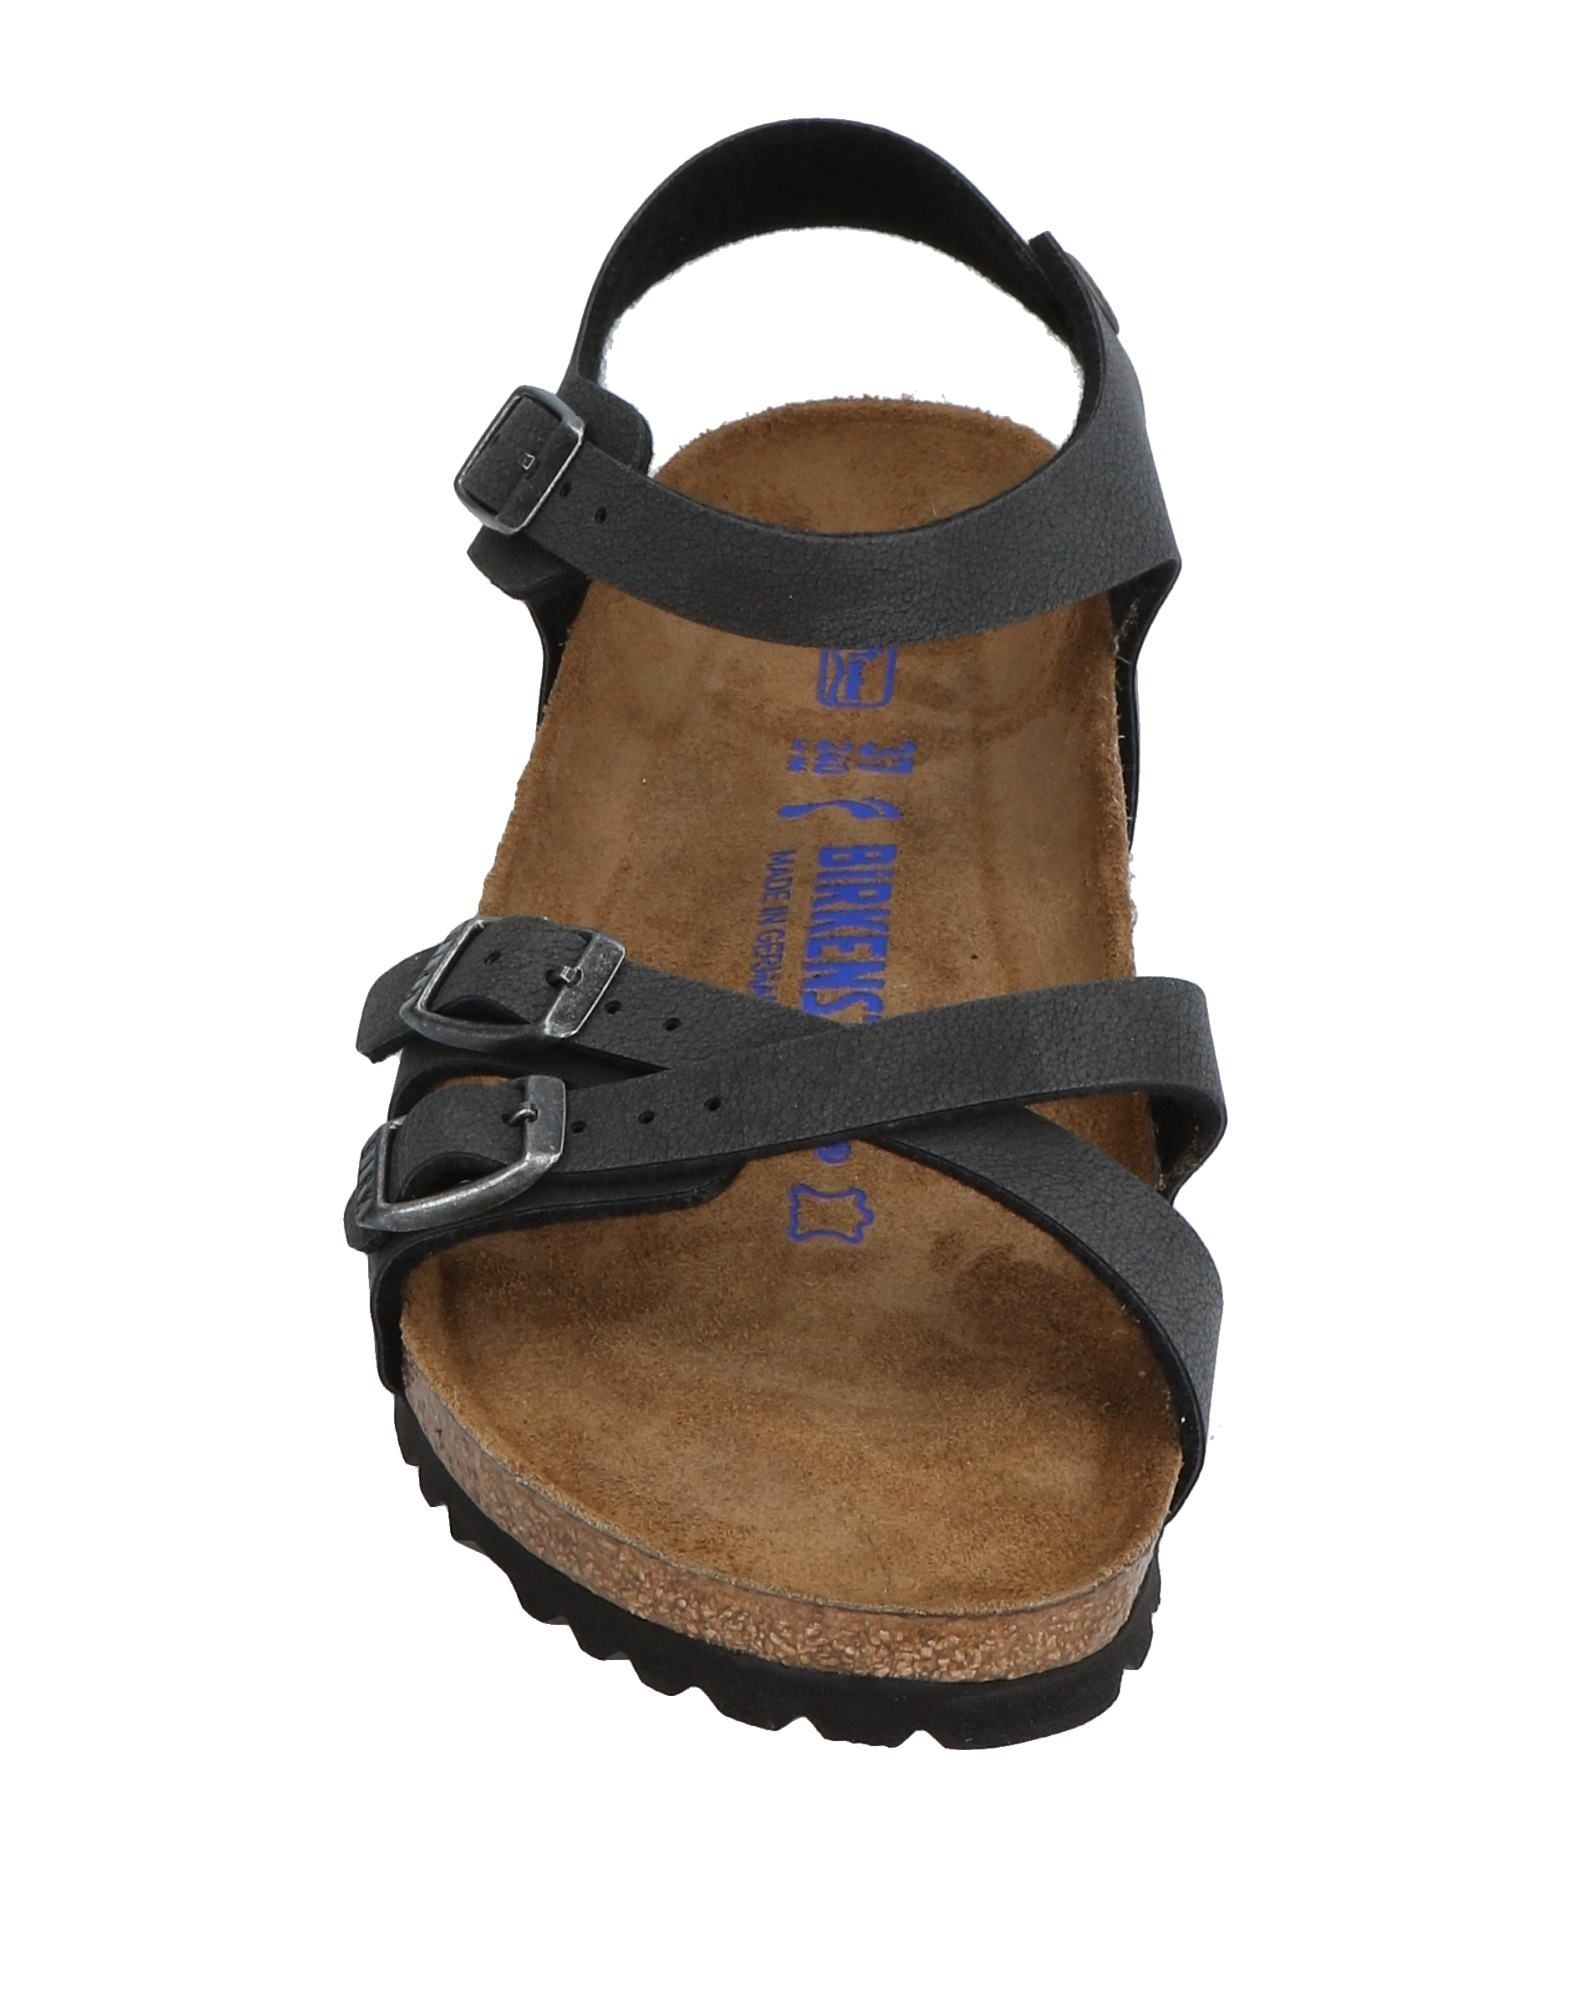 Birkenstock Sandalen Damen  11445578BU Gute Qualität beliebte Schuhe